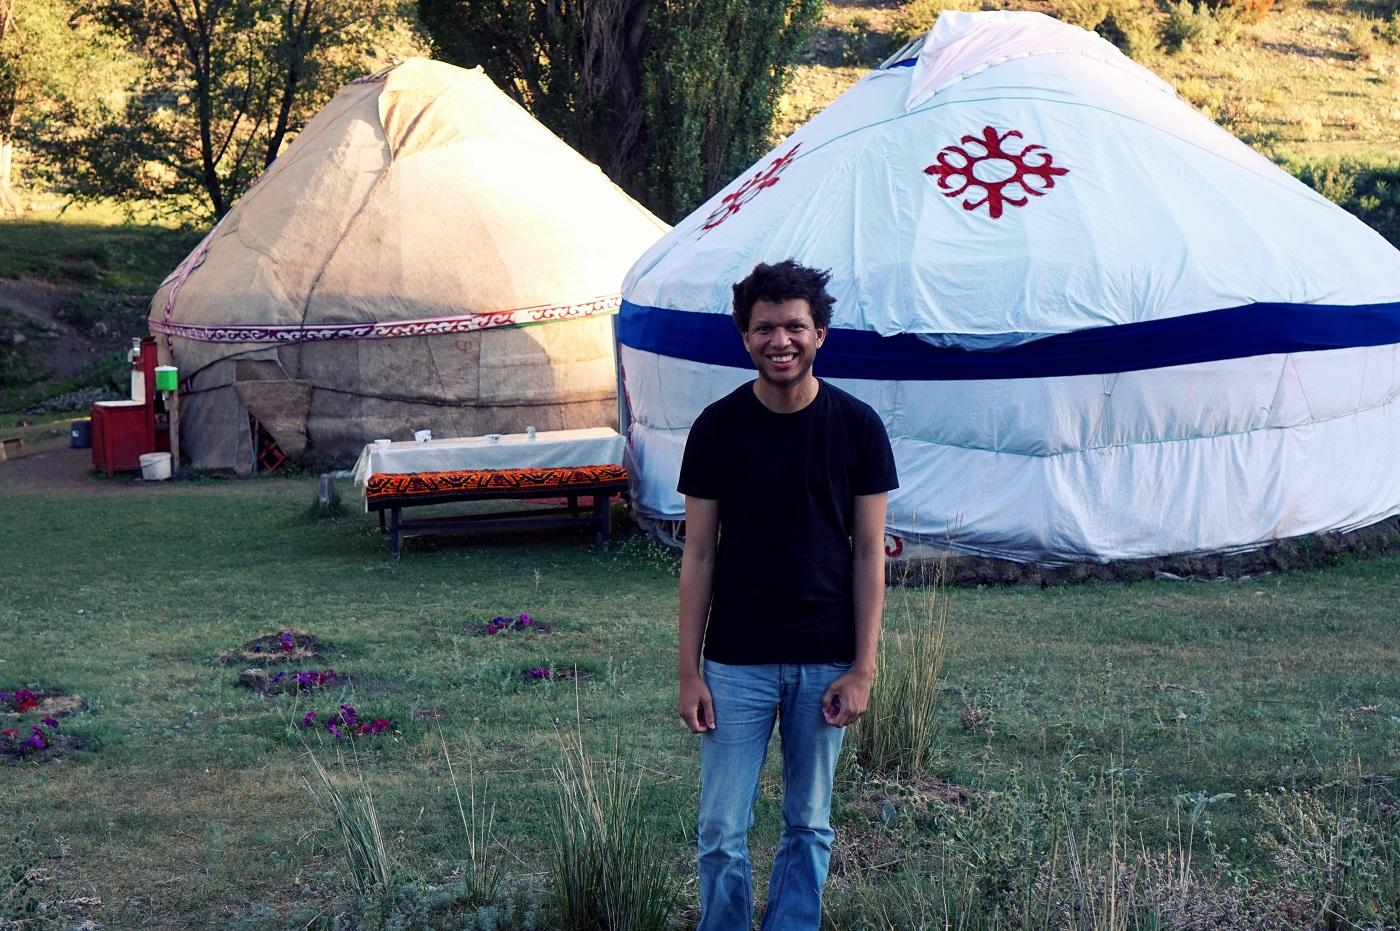 yurt life in kazakhstan - nomad life, steppe